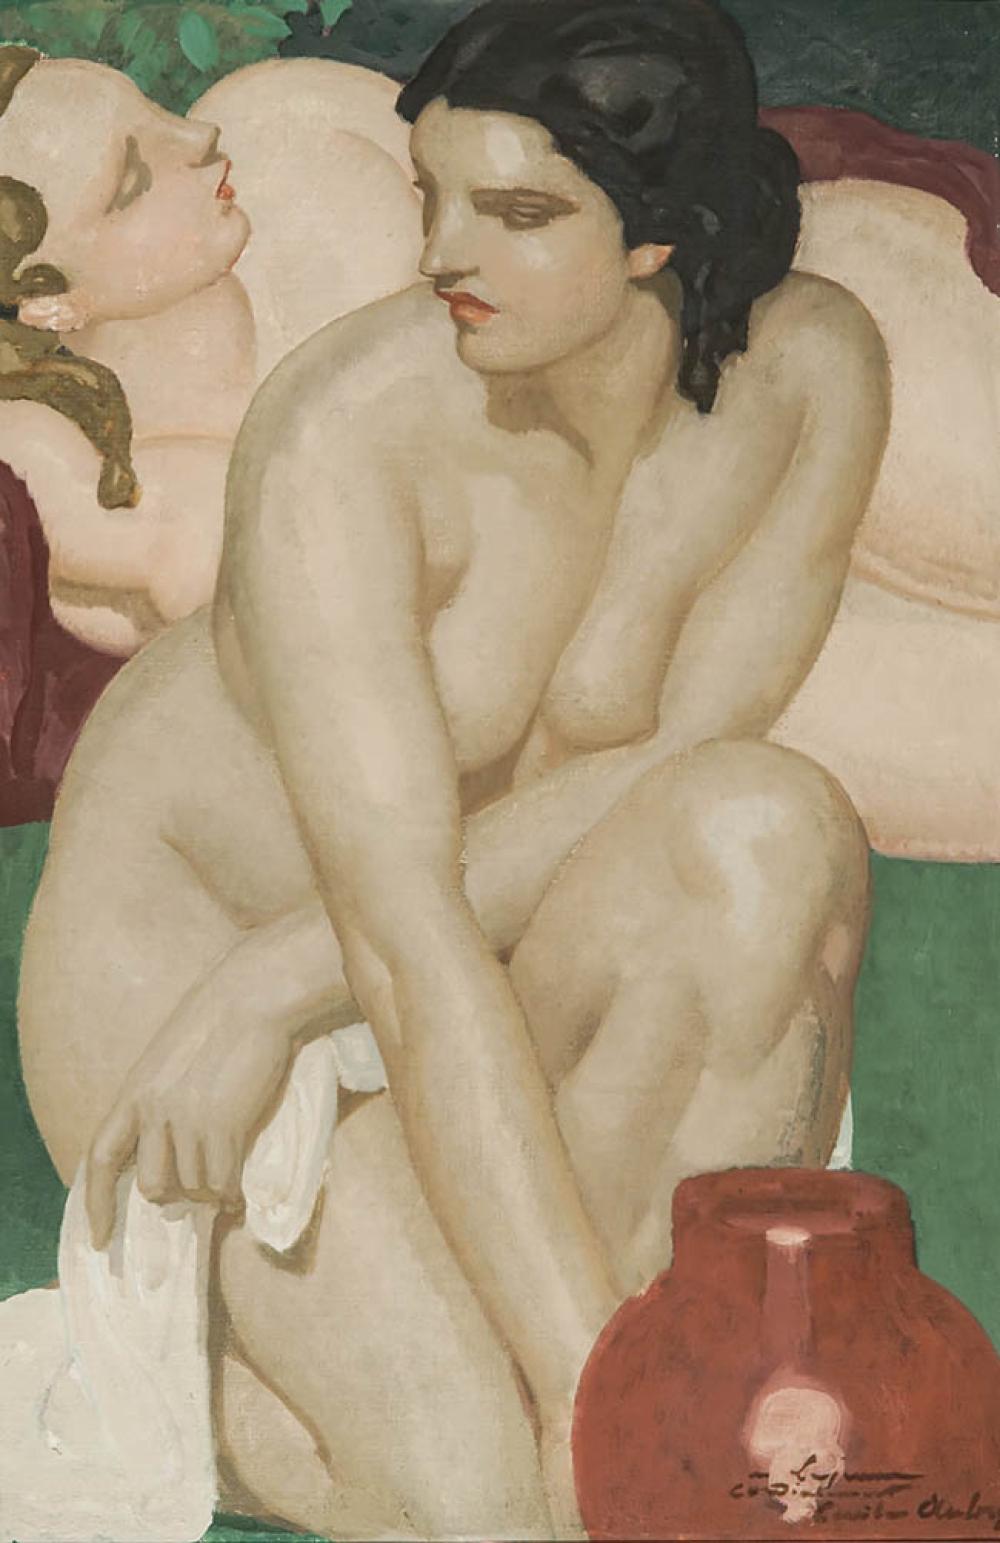 European School, 20th Century, Les Deux Amies, Oil on Canvas, 31-1/2 x 20-3/4 in